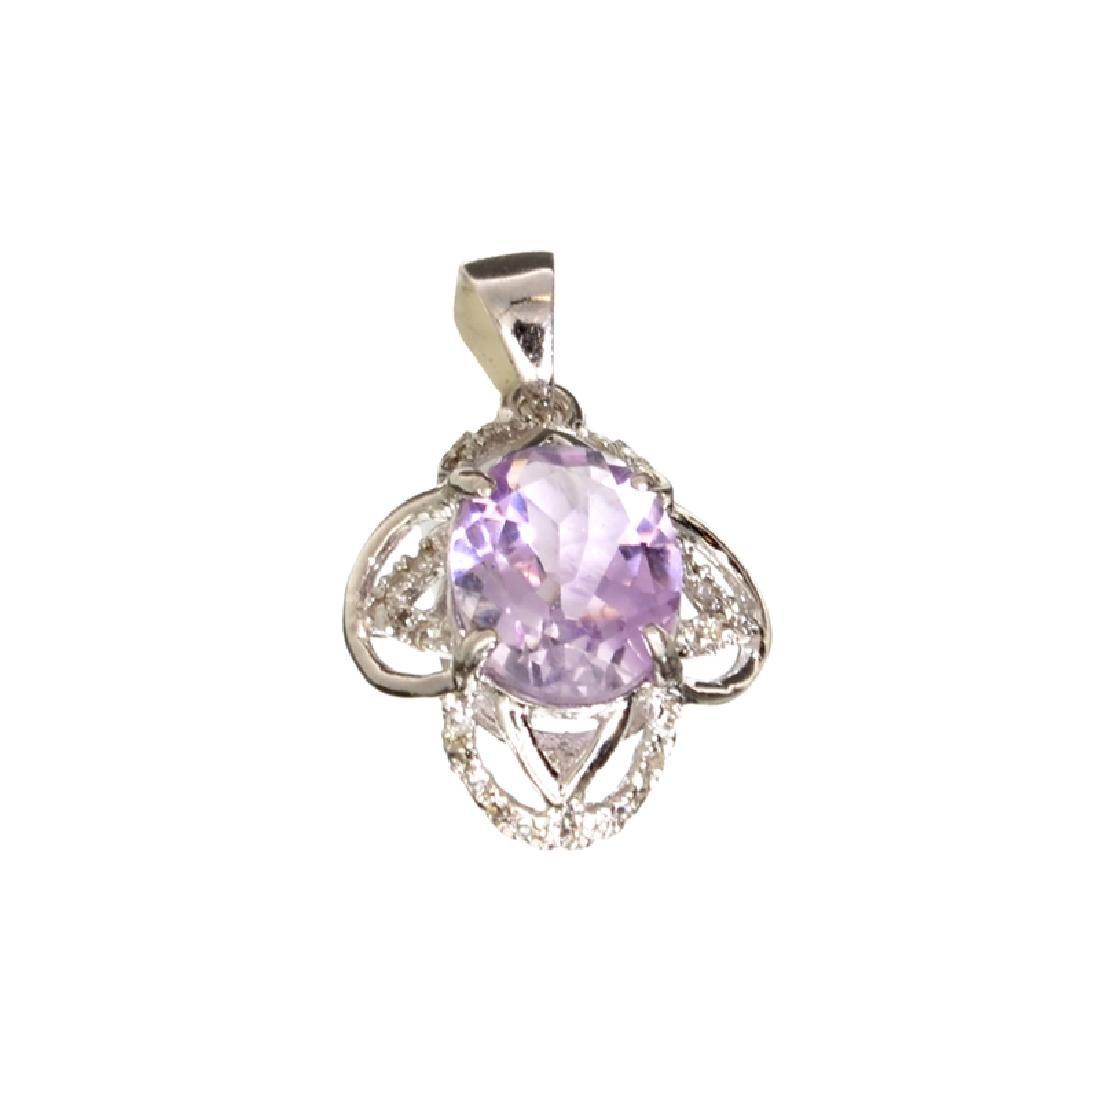 APP: 0.6k Fine Jewelry 2.50CT Purple Amethyst And White